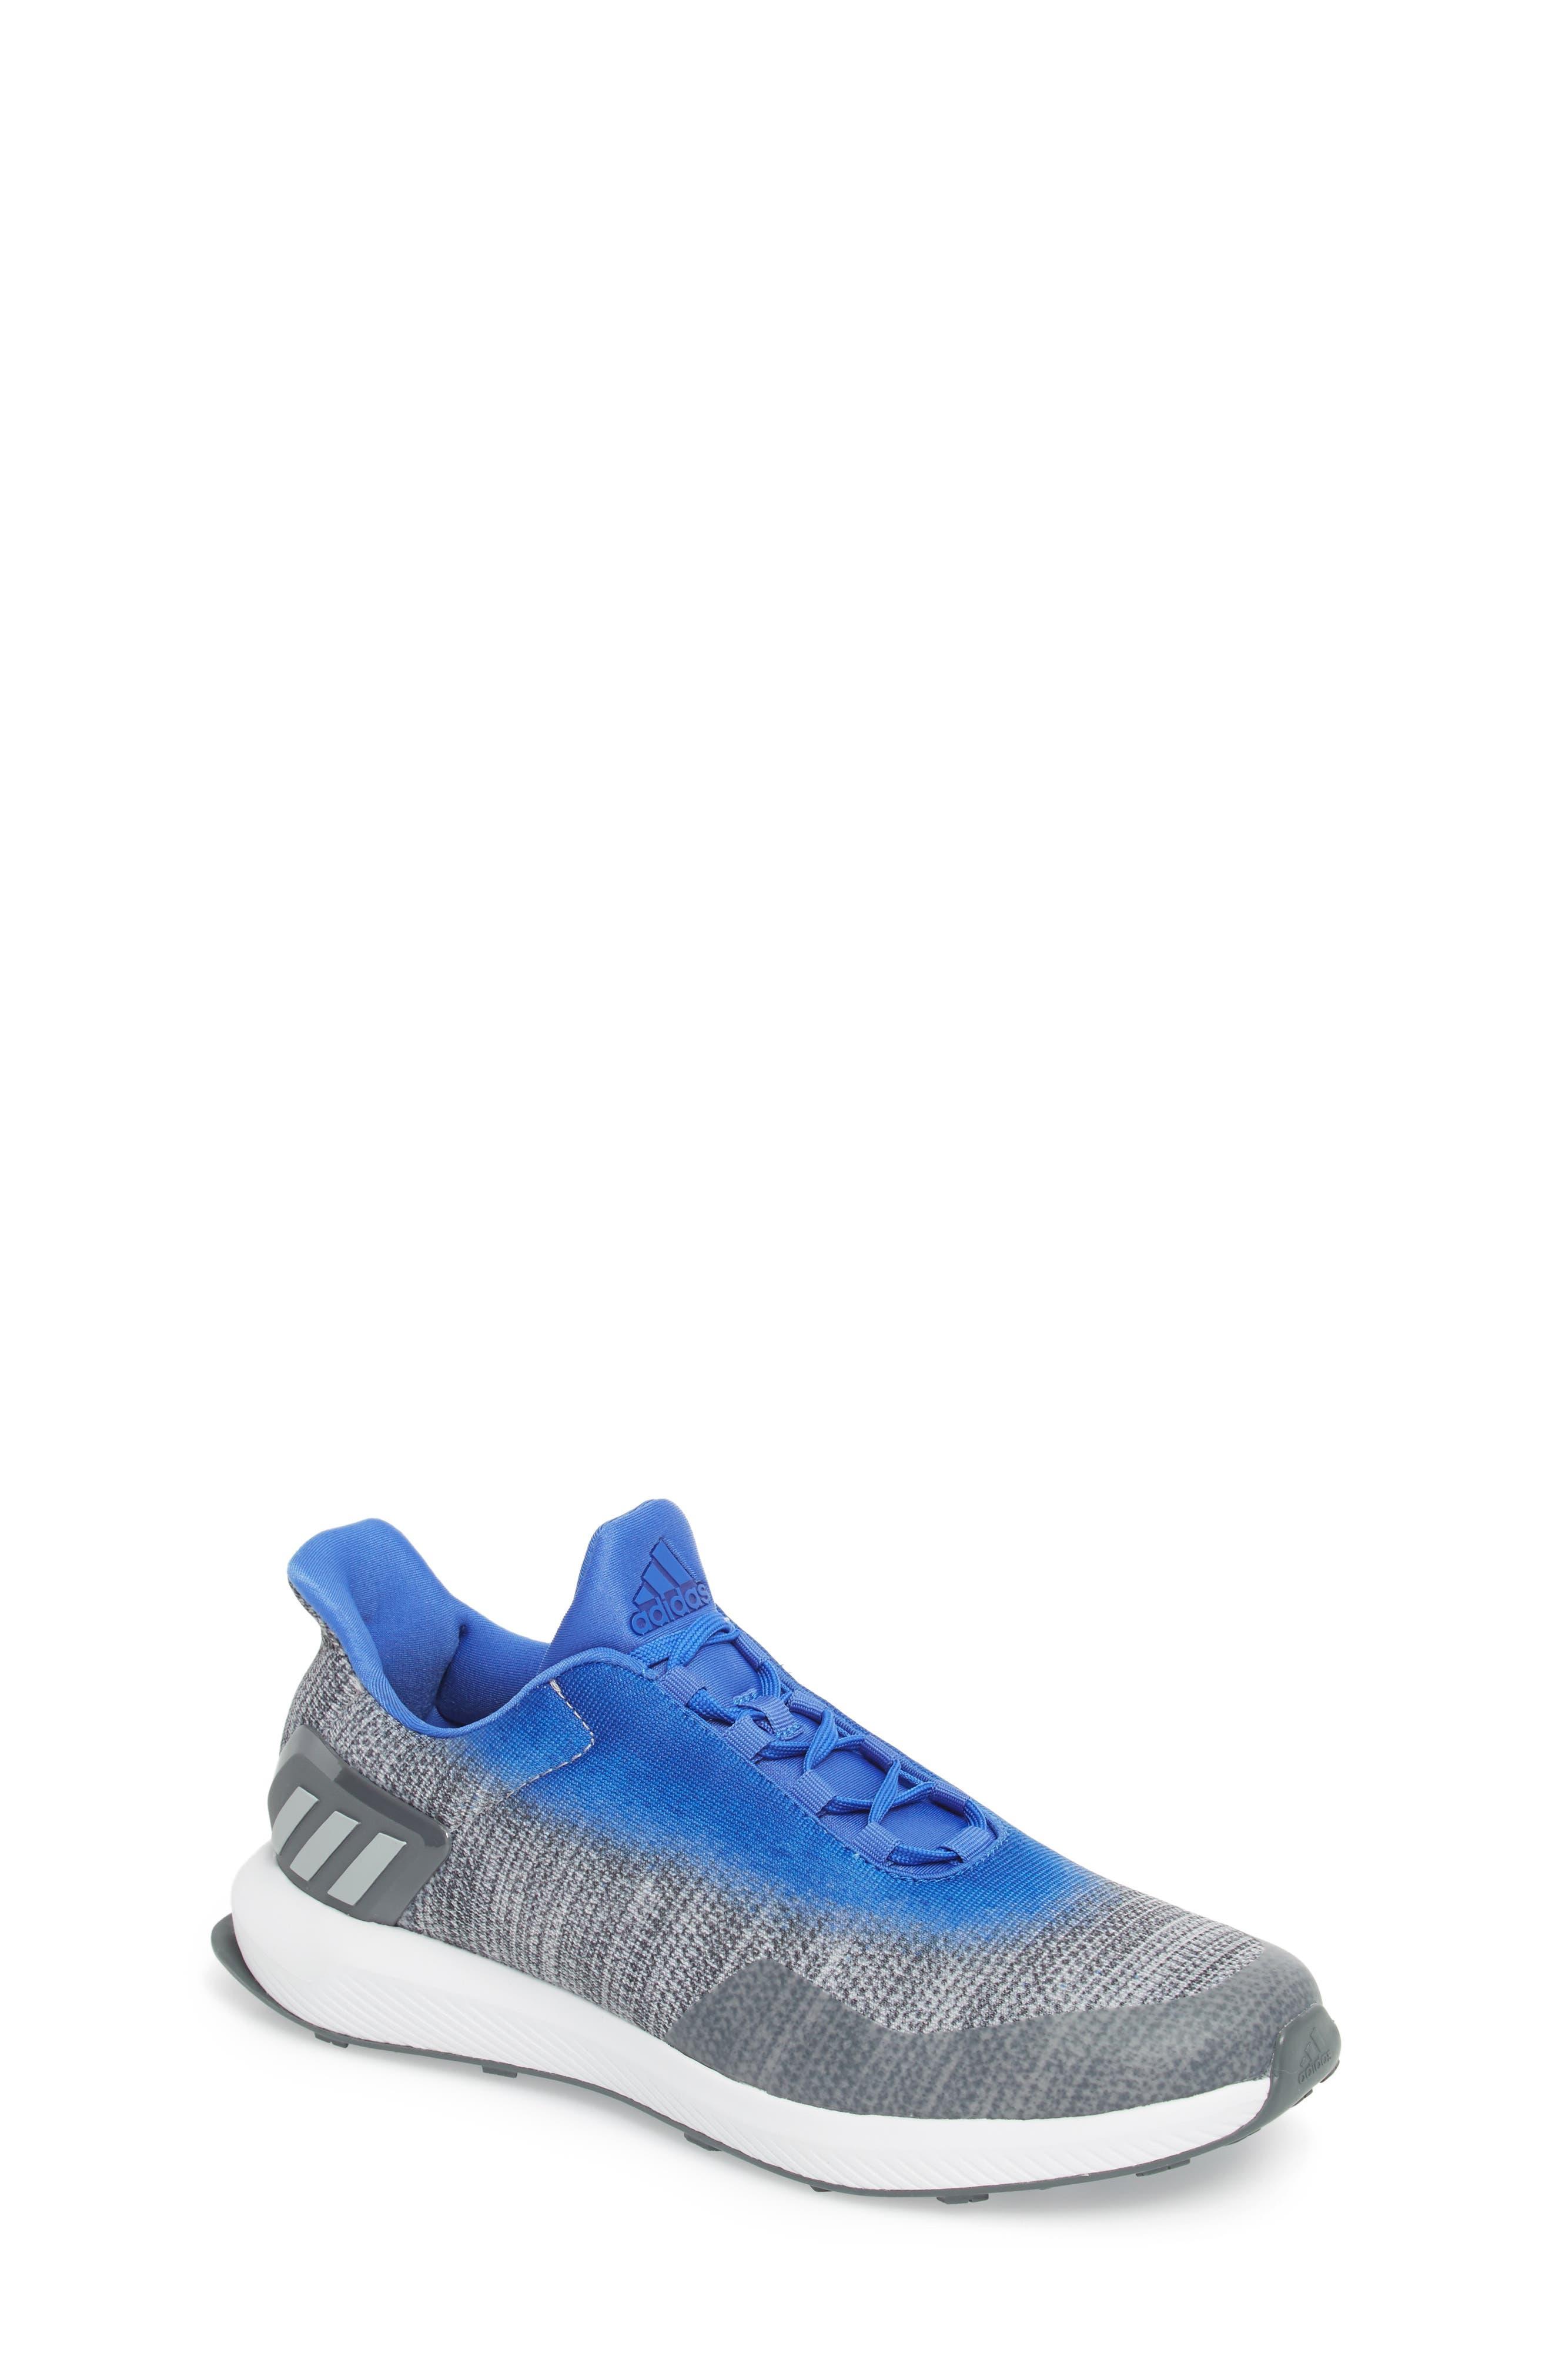 RapidaRun Uncaged Sneaker,                             Main thumbnail 1, color,                             Grey / Grey / Blue